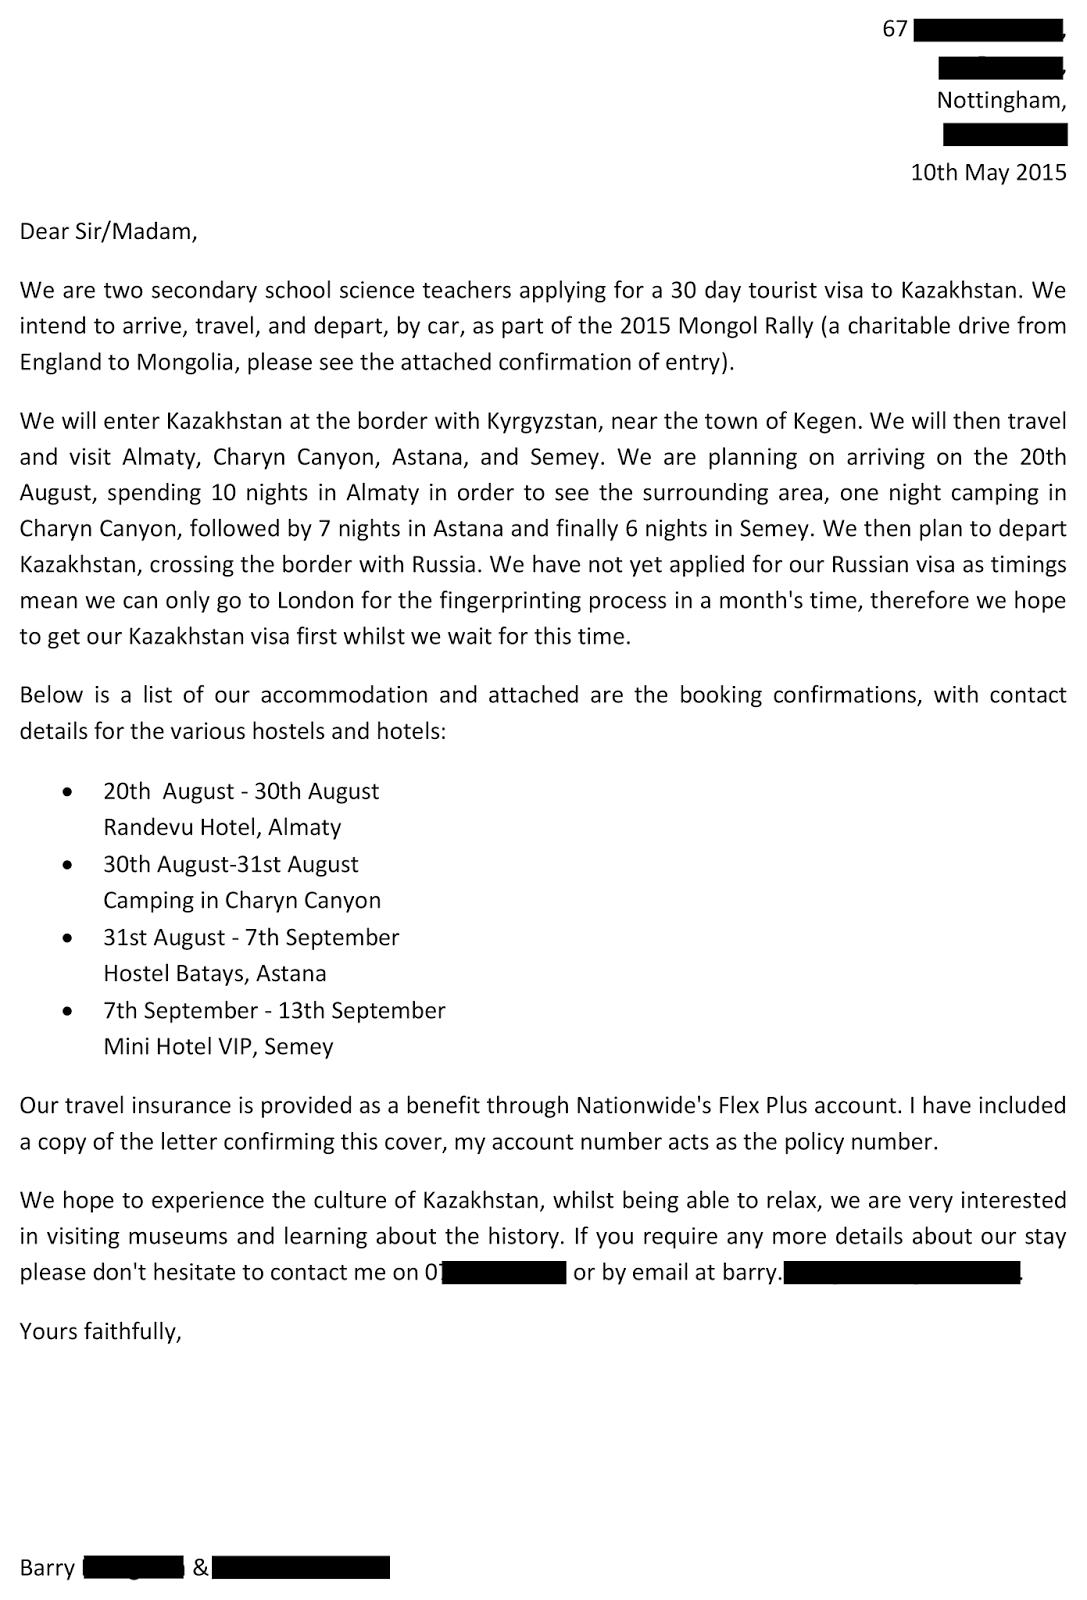 Team Gobiyond Mongol Rally Cover Letters Sharelatex Online Latex